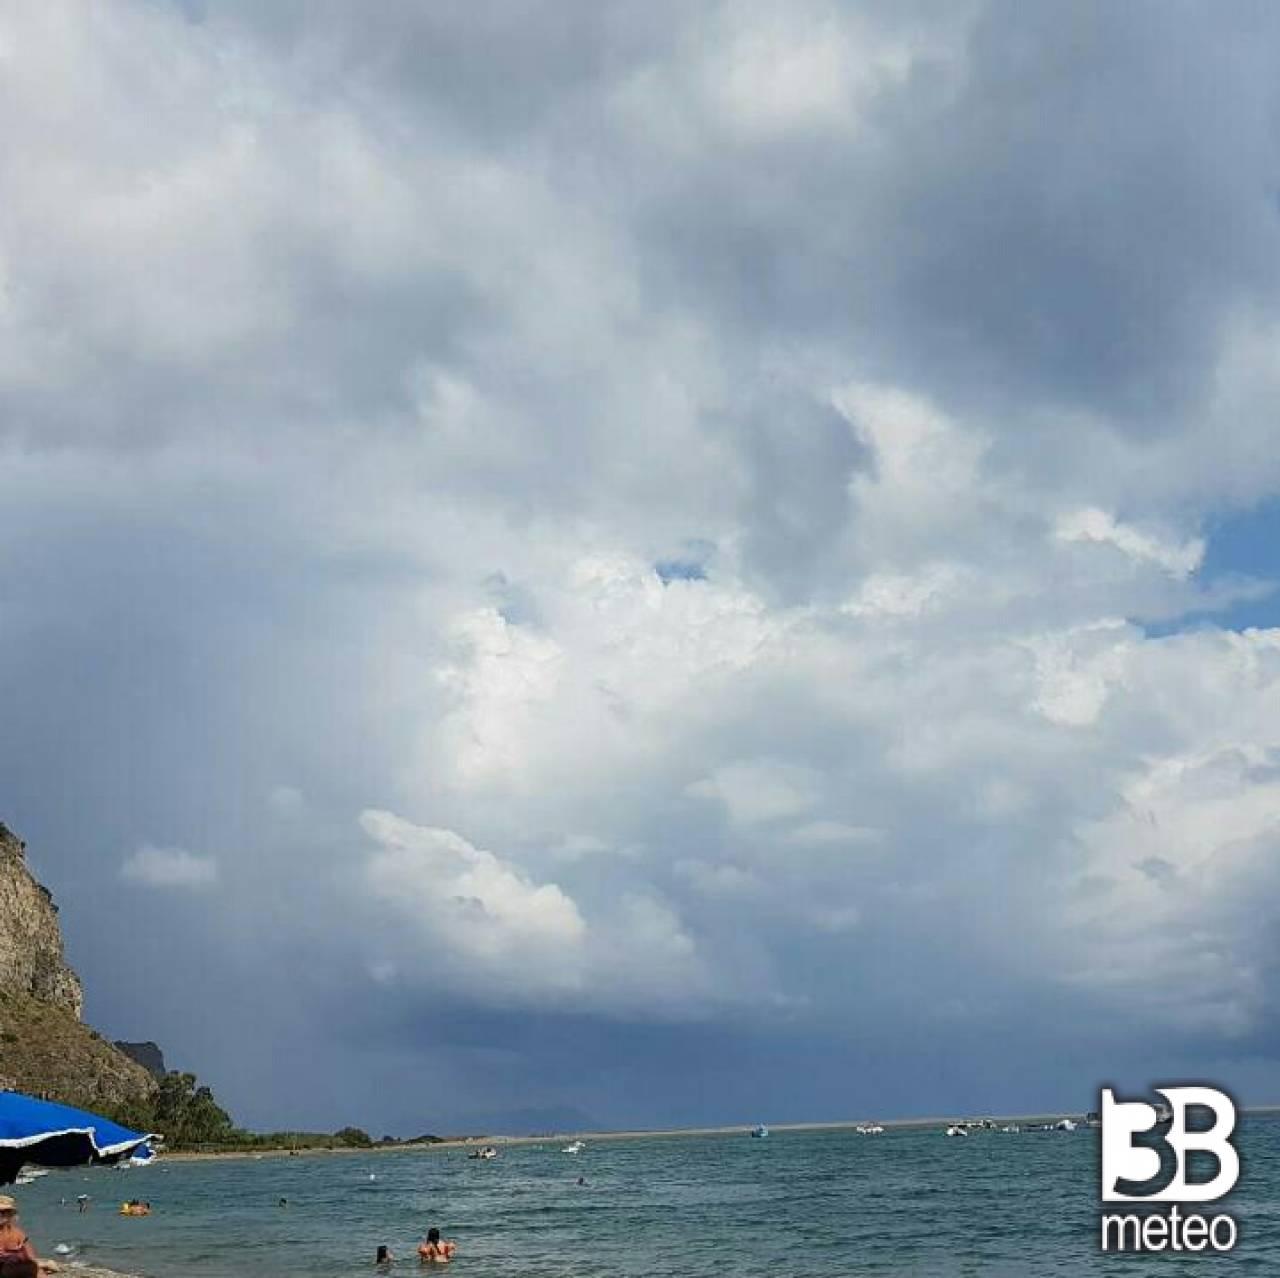 Fotosegnalazione di oliveri foto gallery 3b meteo - 3b meteo bagno di romagna ...